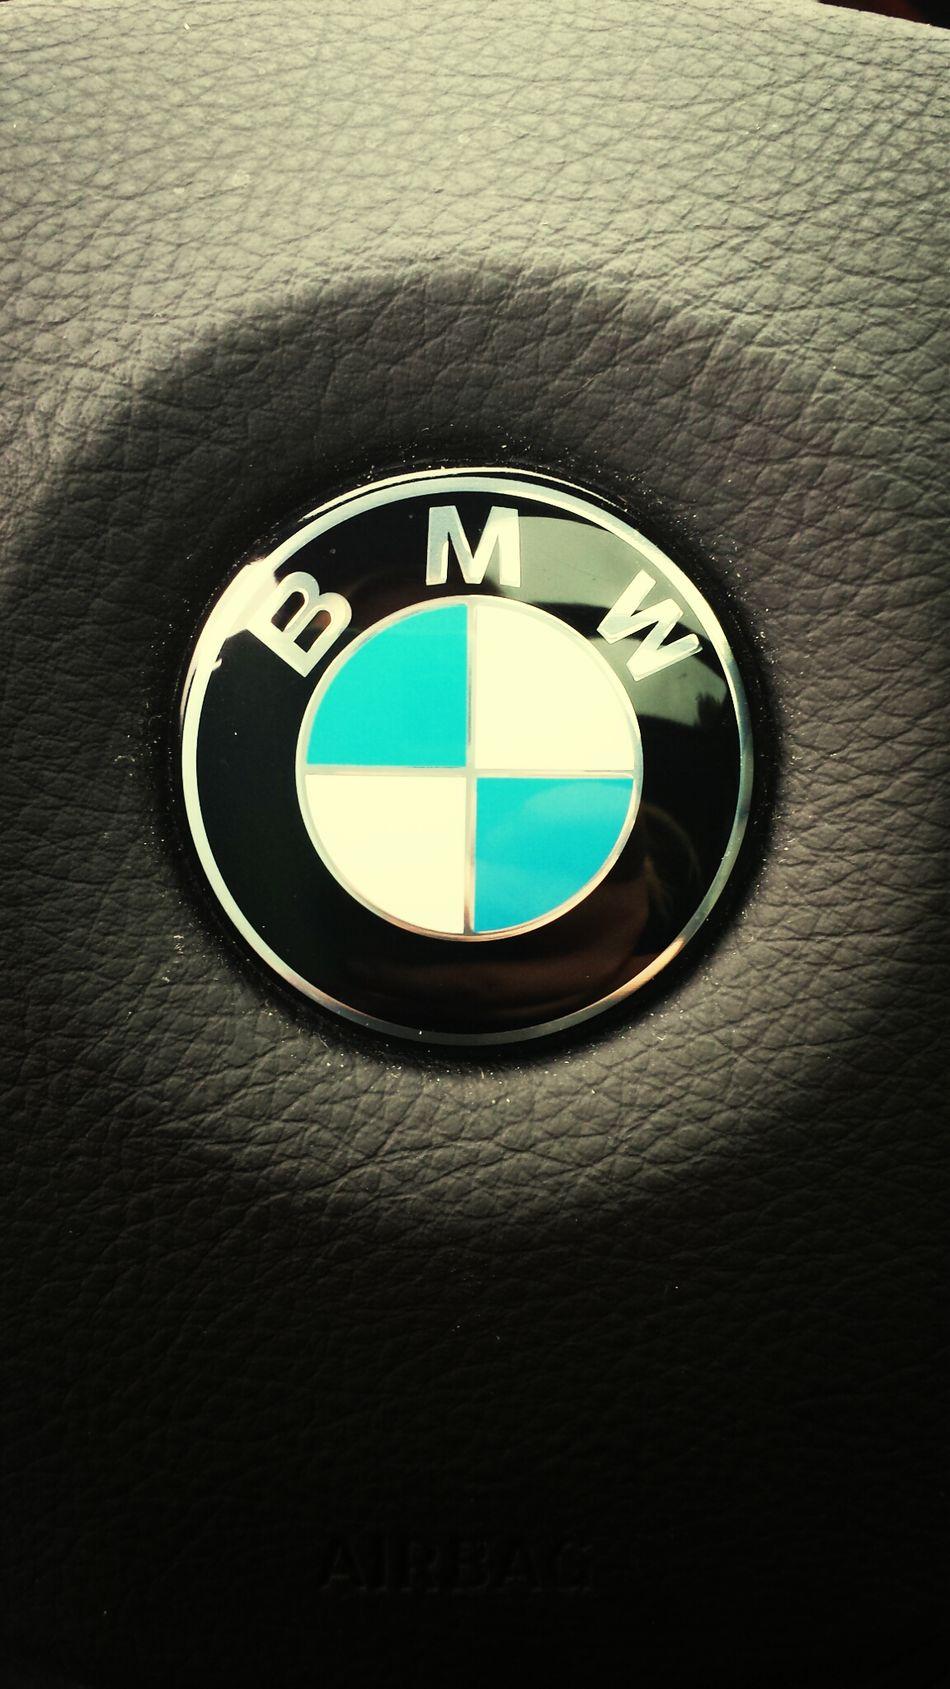 Bmw ♥ Bmw Car PhonePhotography